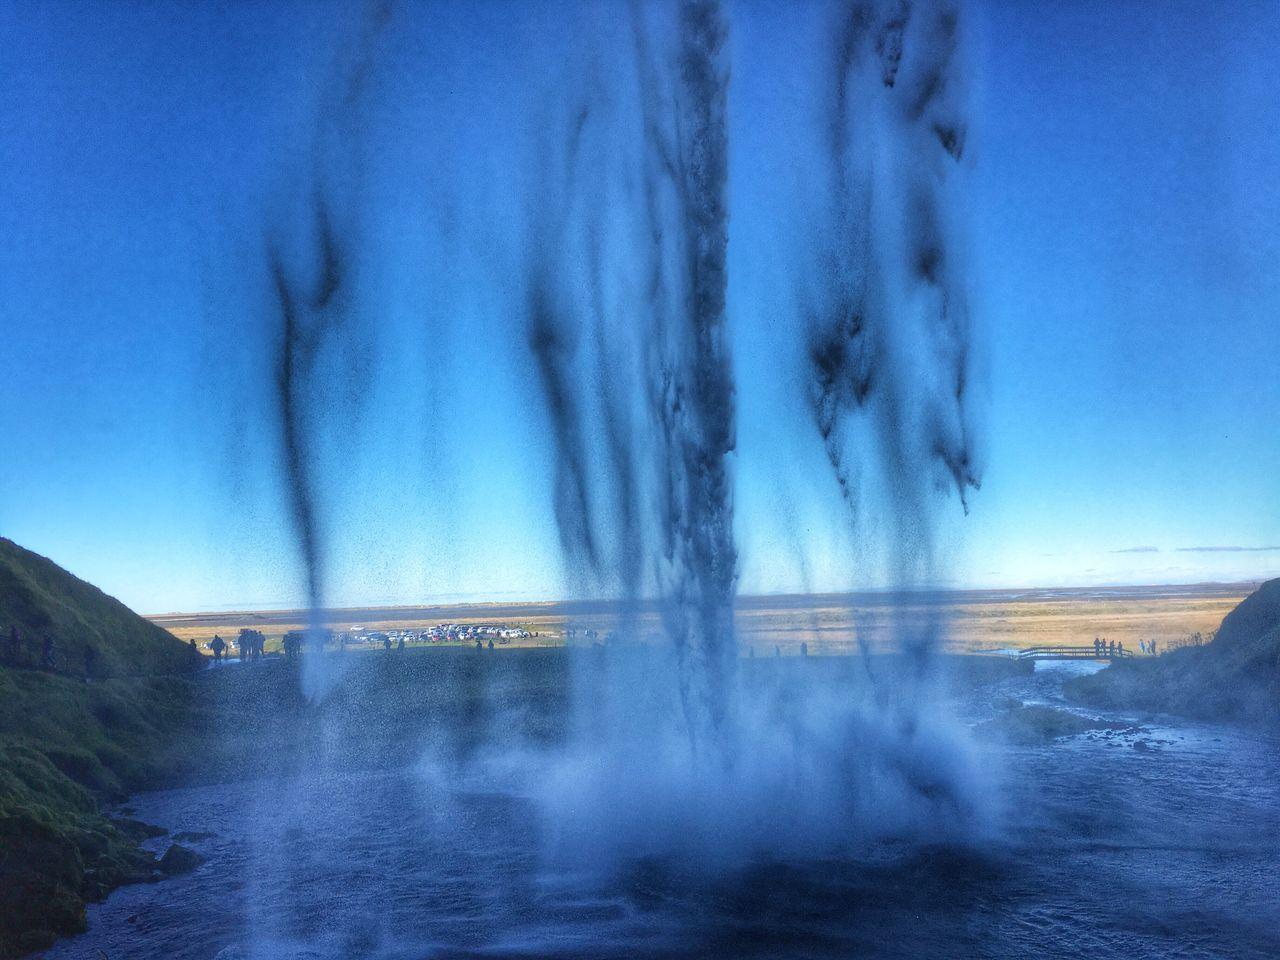 Blurred Motion Of Water Splashing Against Blue Sky